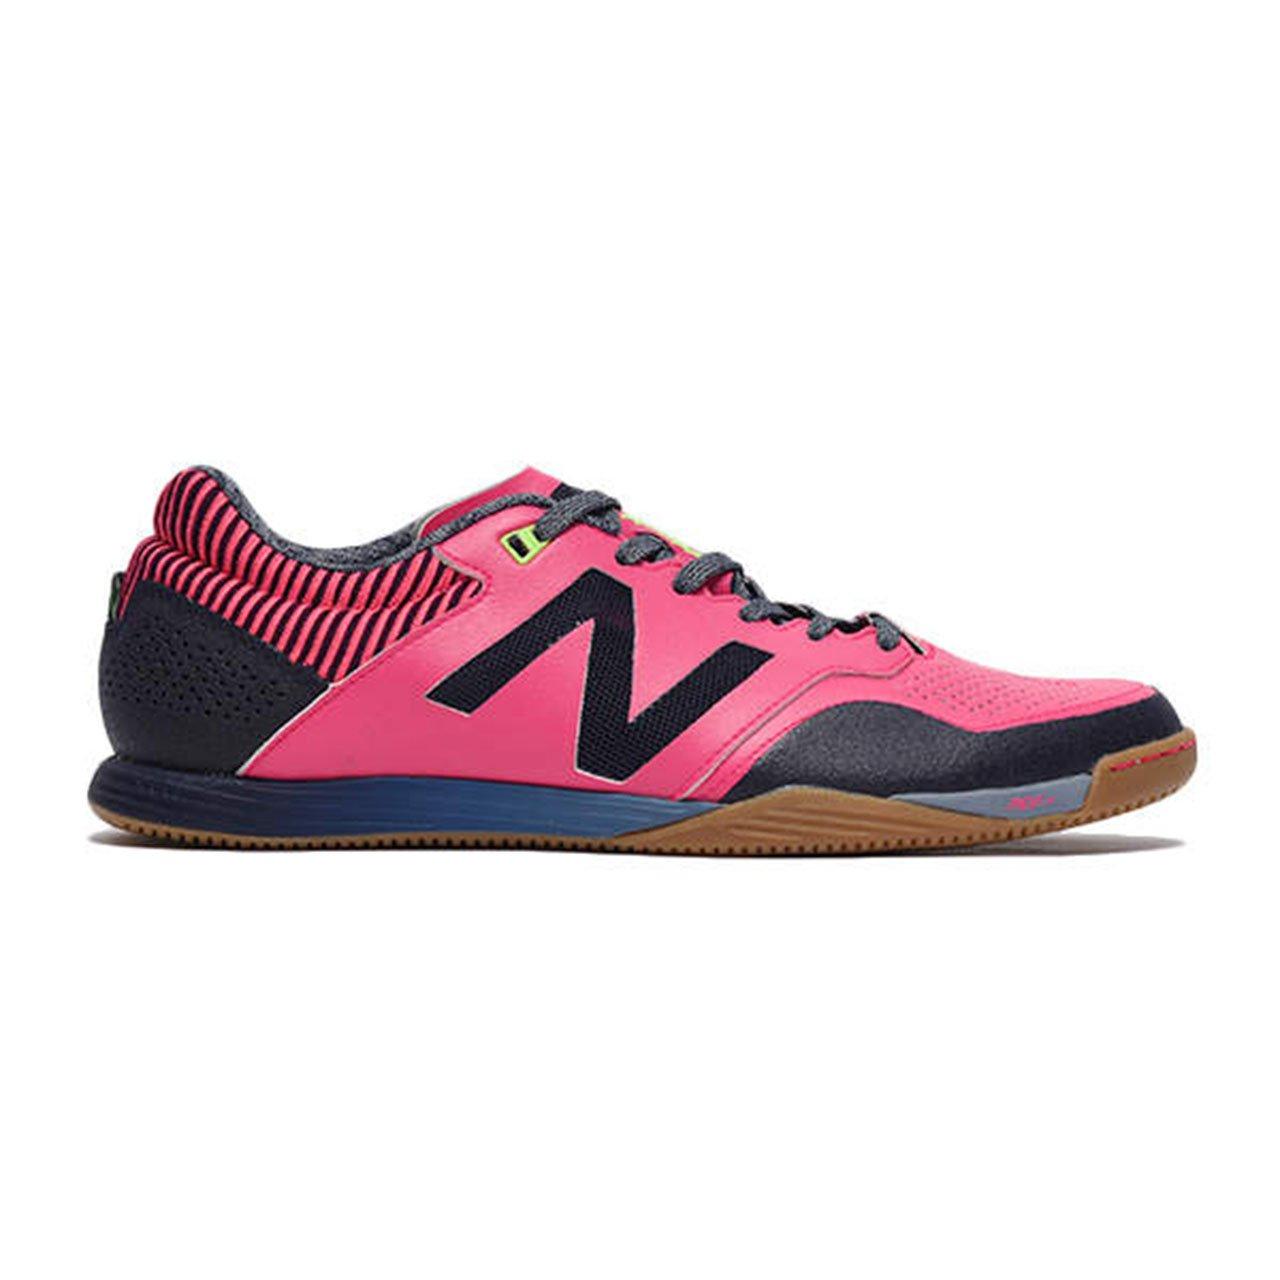 new balance(ニューバランス) AUDAZO PRO ID (msapipd2) B073S77DCB 24 Dやや細い